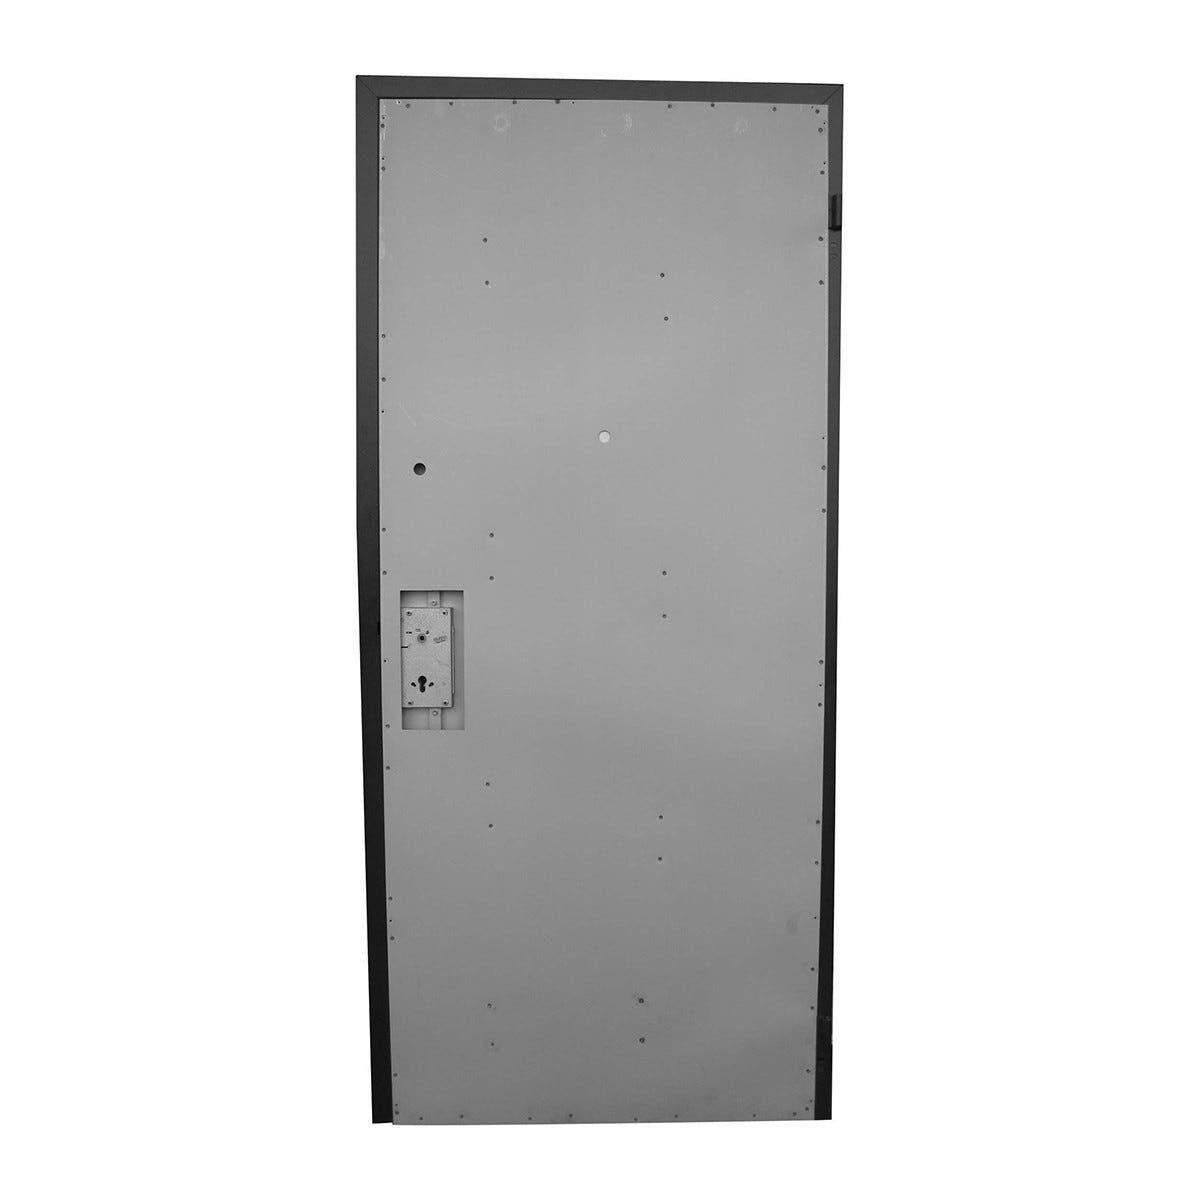 Porta Blindata Naked Eco Pro Apertura Spinta A Destra 210x90 Cm (Hxl)